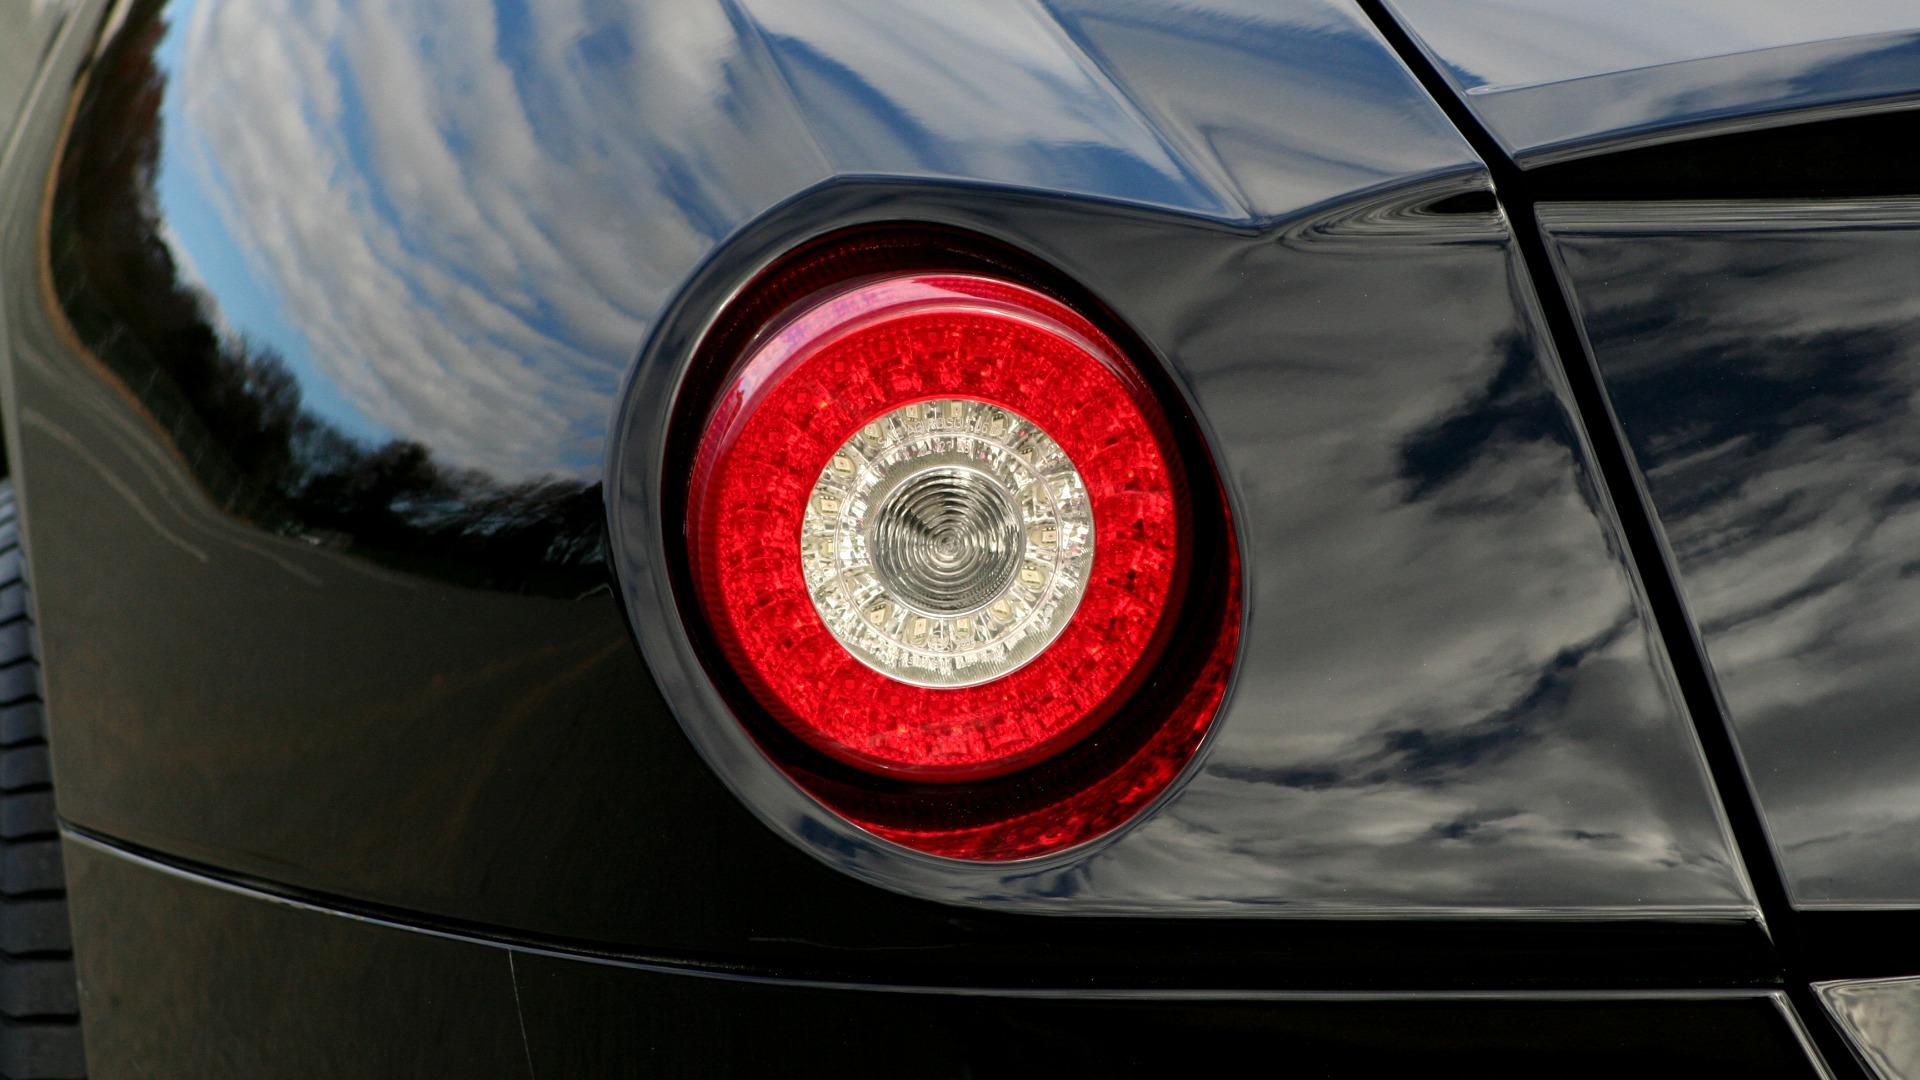 Used 2007 Ferrari 599 GTB FIORANO HGTE / V12 / F1 TRANS / NAV / BOSE / CUSTOM WHEELS for sale $109,999 at Formula Imports in Charlotte NC 28227 17